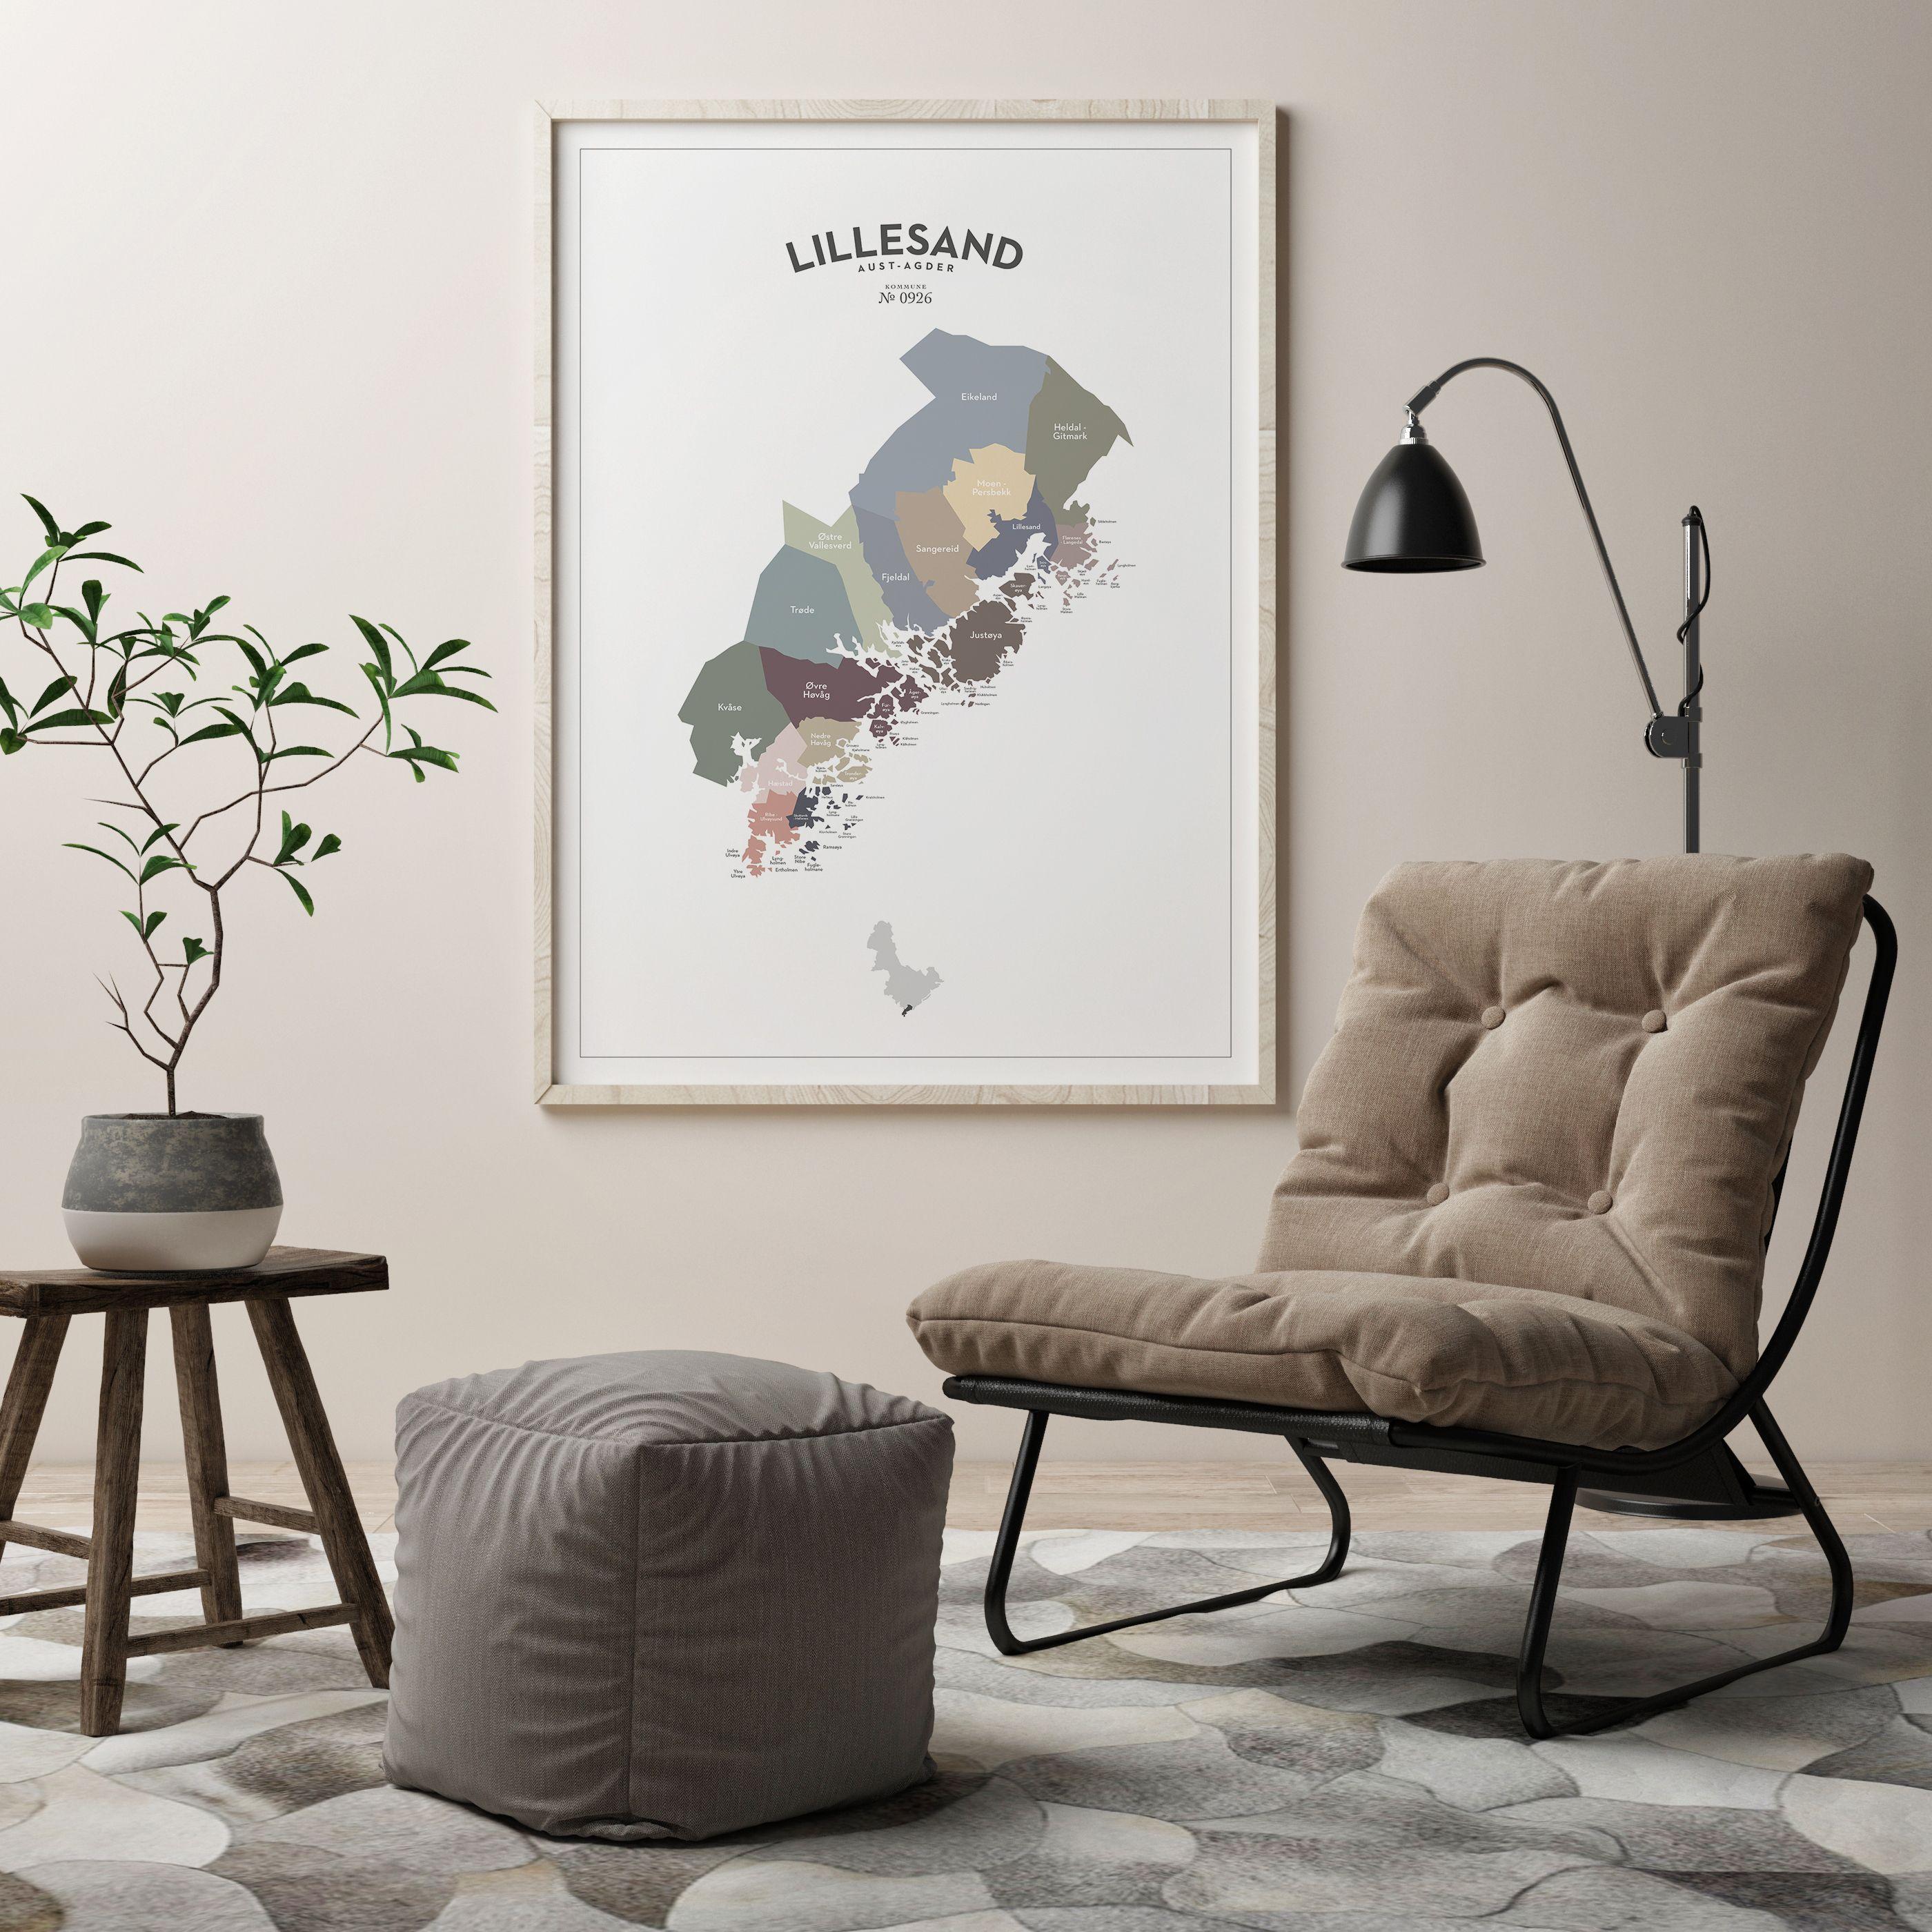 kart høvåg LILLESAND • #Lillesand #poster #plakat #veggpynt #minimalistisk  kart høvåg